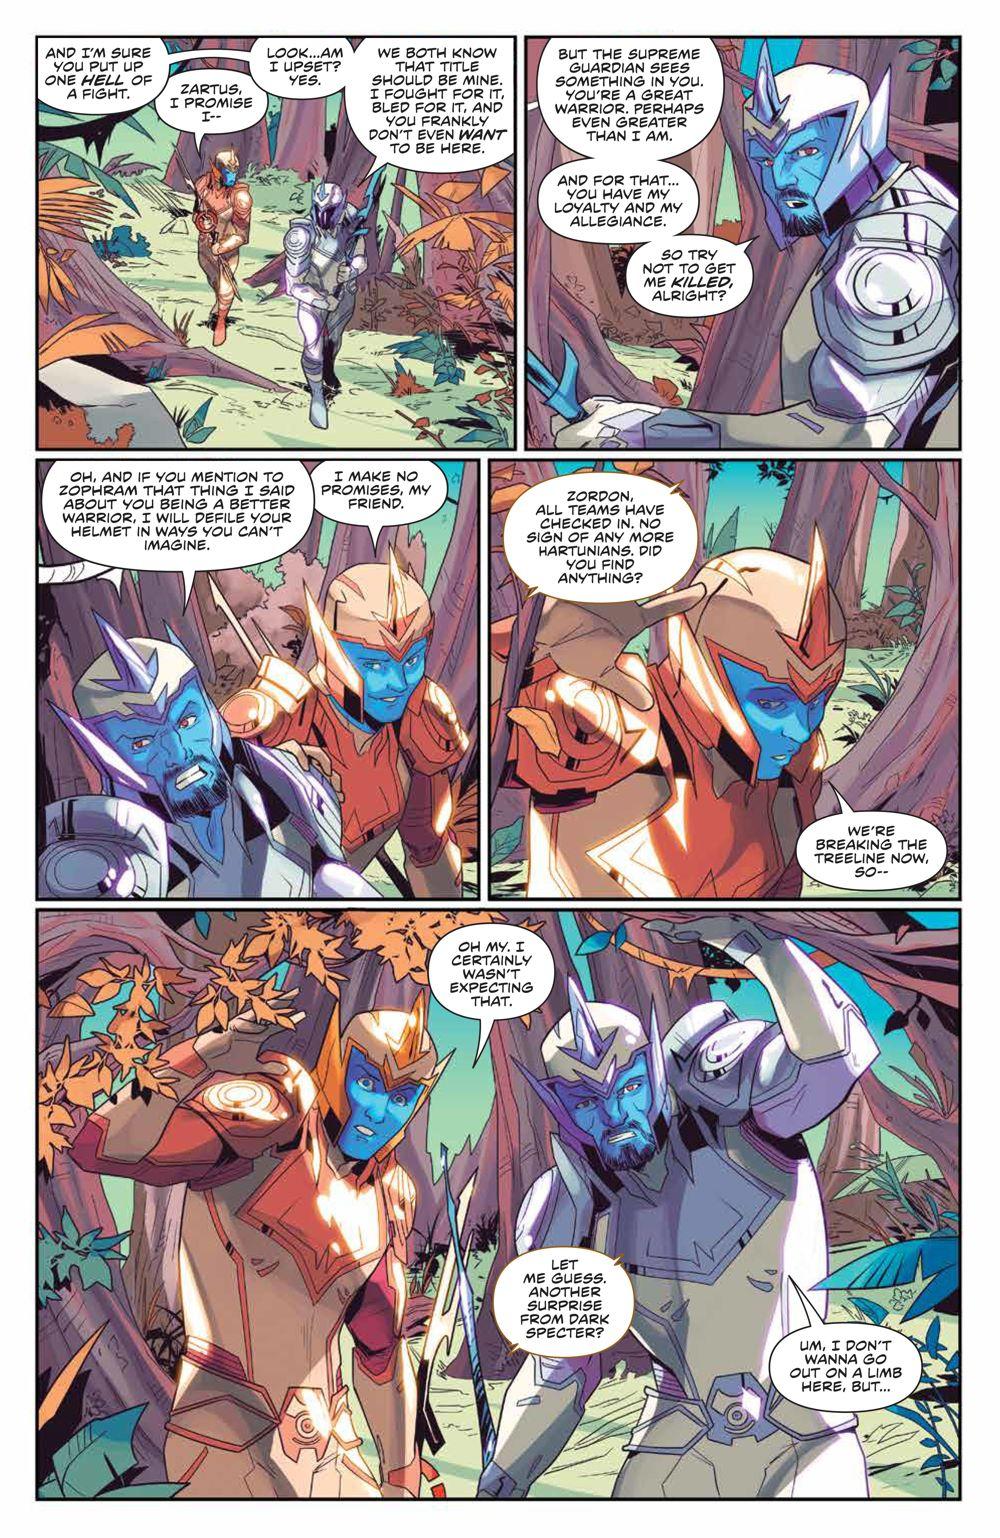 MightyMorphin_006_PRESS_5 ComicList Previews: MIGHTY MORPHIN #6